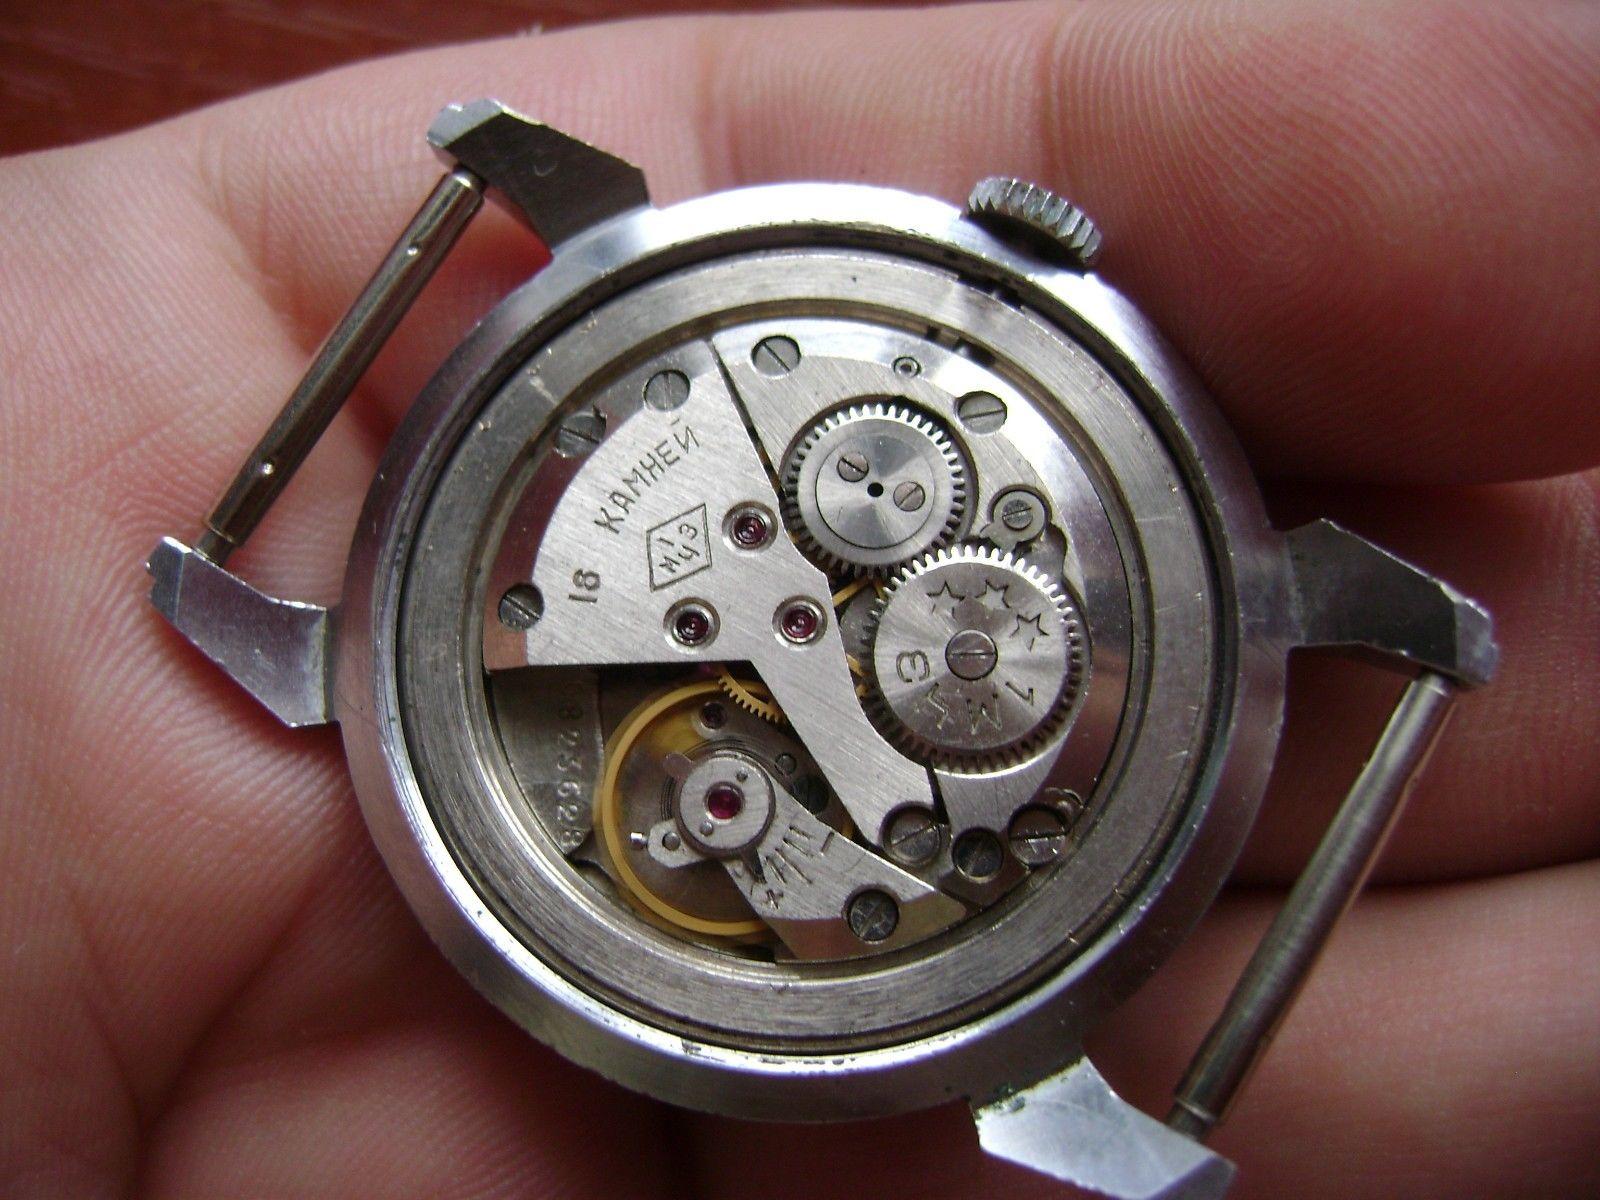 [Conseil d'achat] Kirovskie-Sputnik 160109095104682821